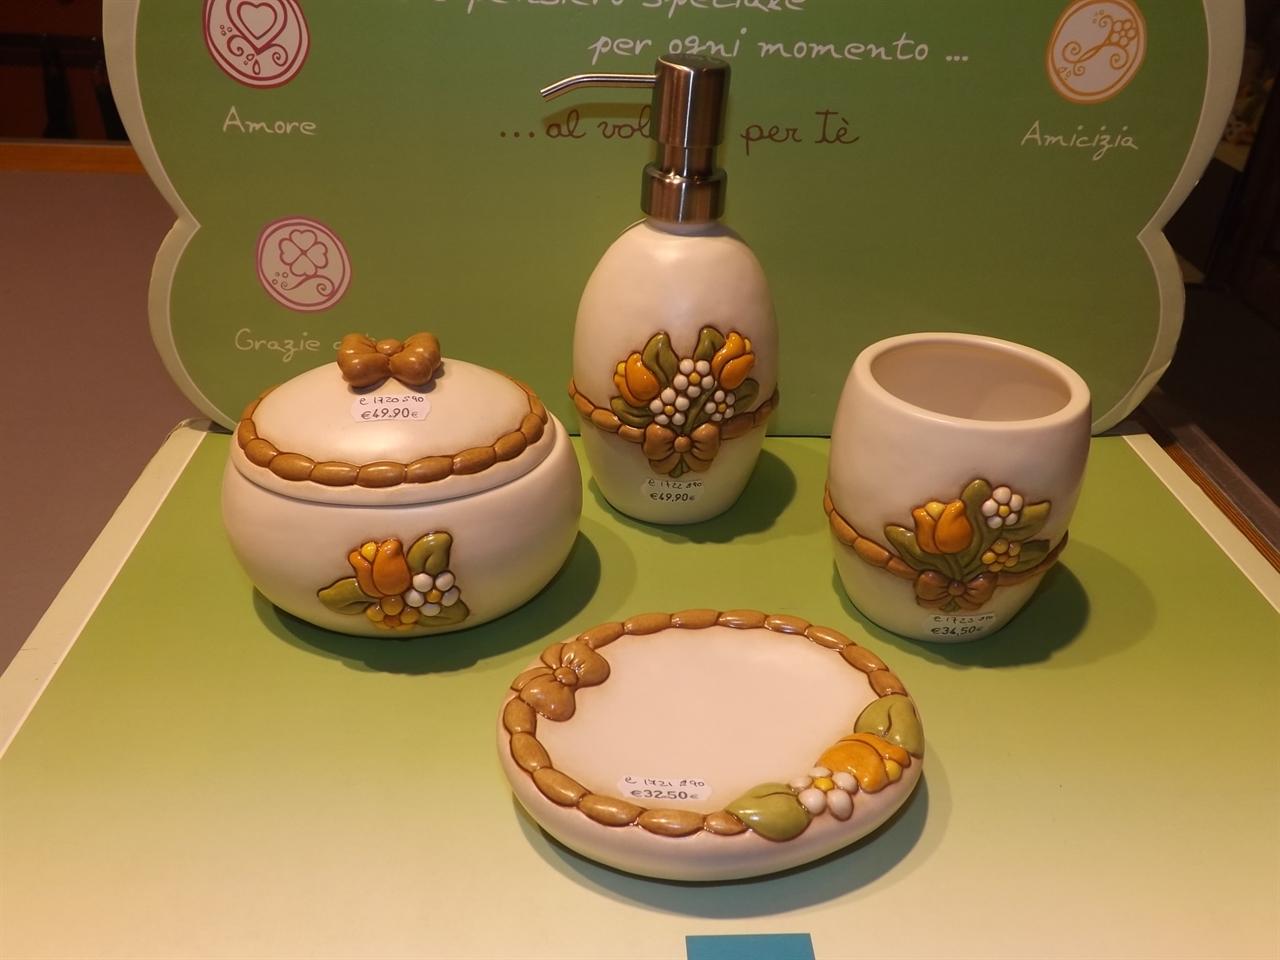 Emejing thun cucina prezzi ideas home interior ideas for Amazon thun saldi